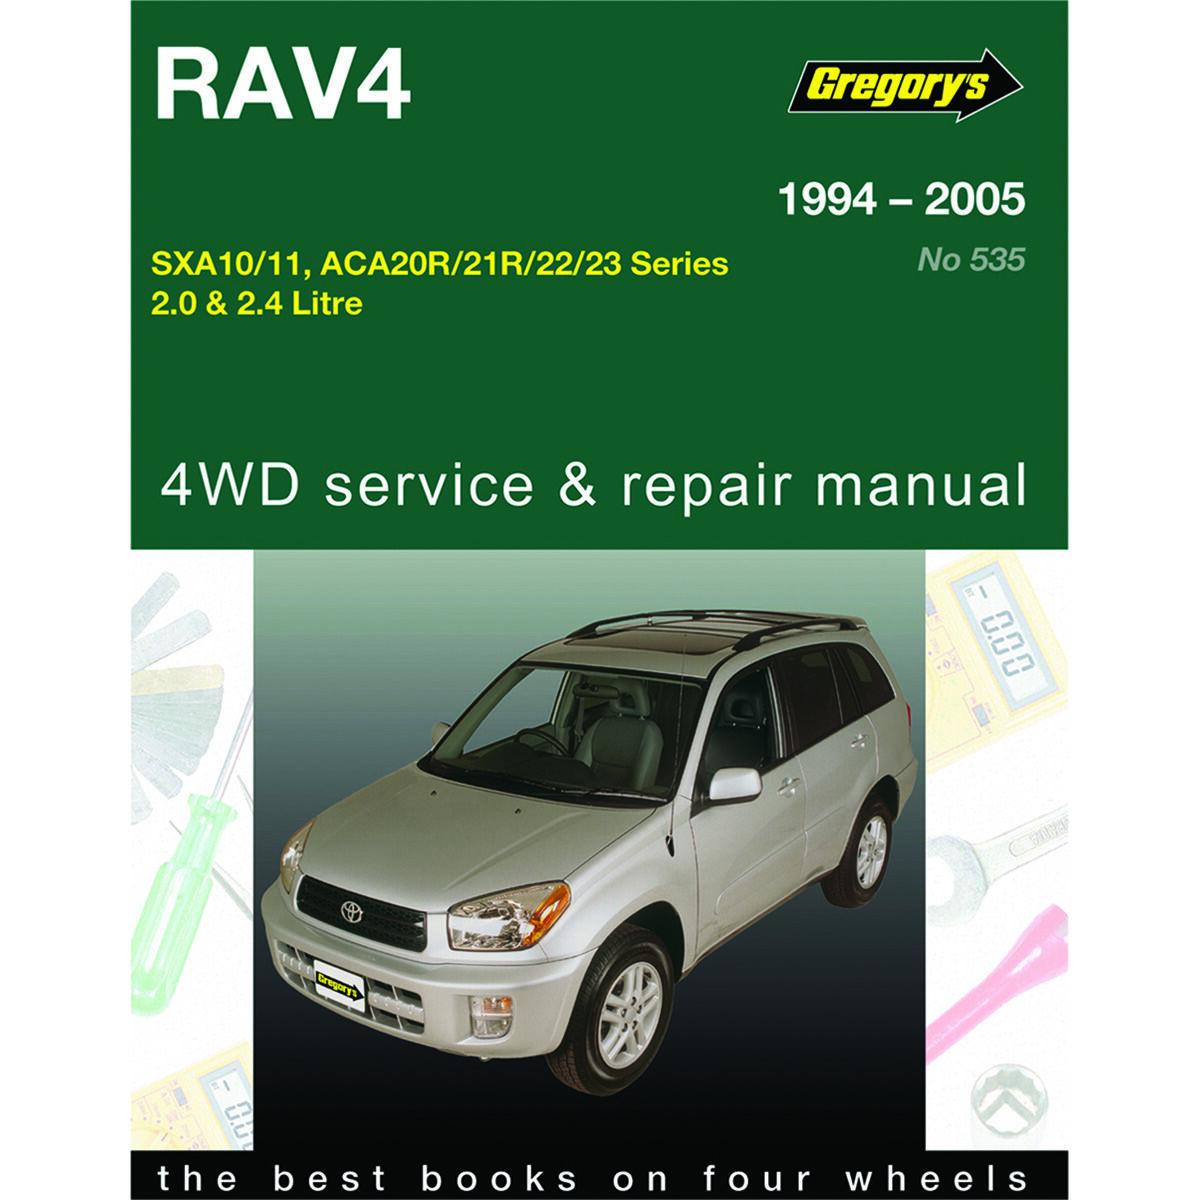 car manual for toyota rav4 1994 2005 535 supercheap auto rh supercheapauto com au Helm Auto Manuals Auto Manual Switch